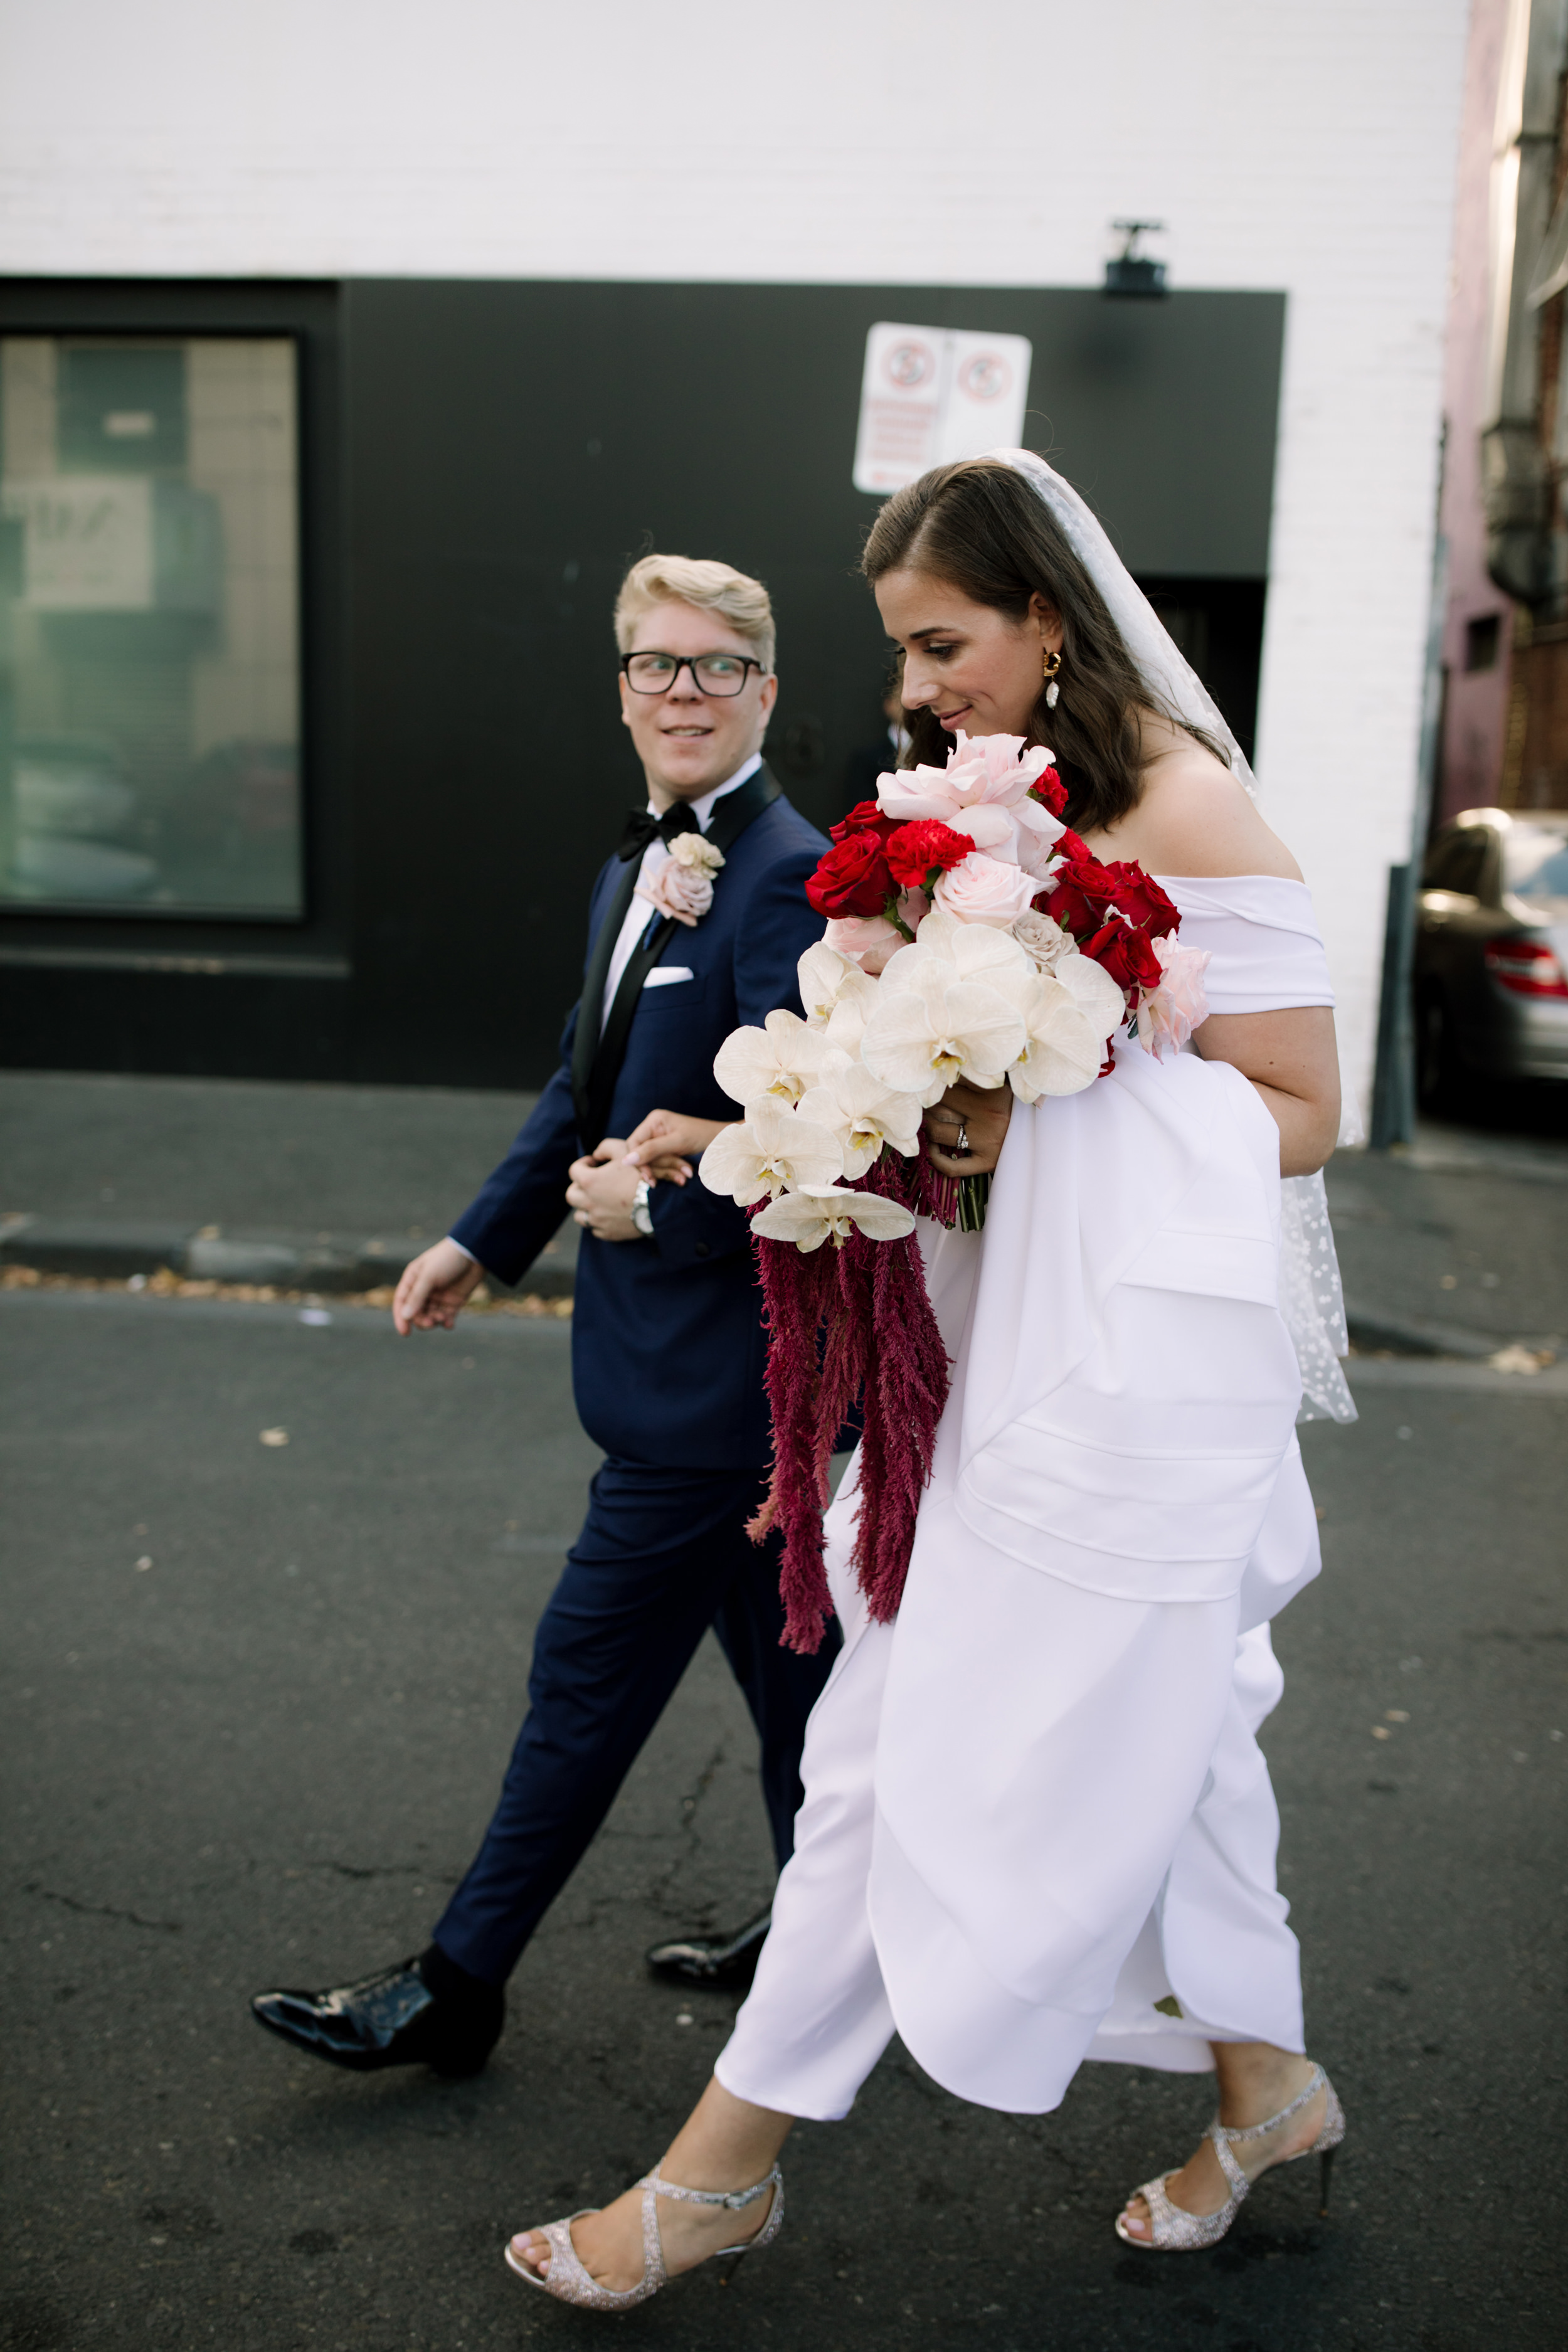 I-Got-You-Babe-Weddings-Tahlia&Mitch-Butler-Lane-Wedding0154.JPG